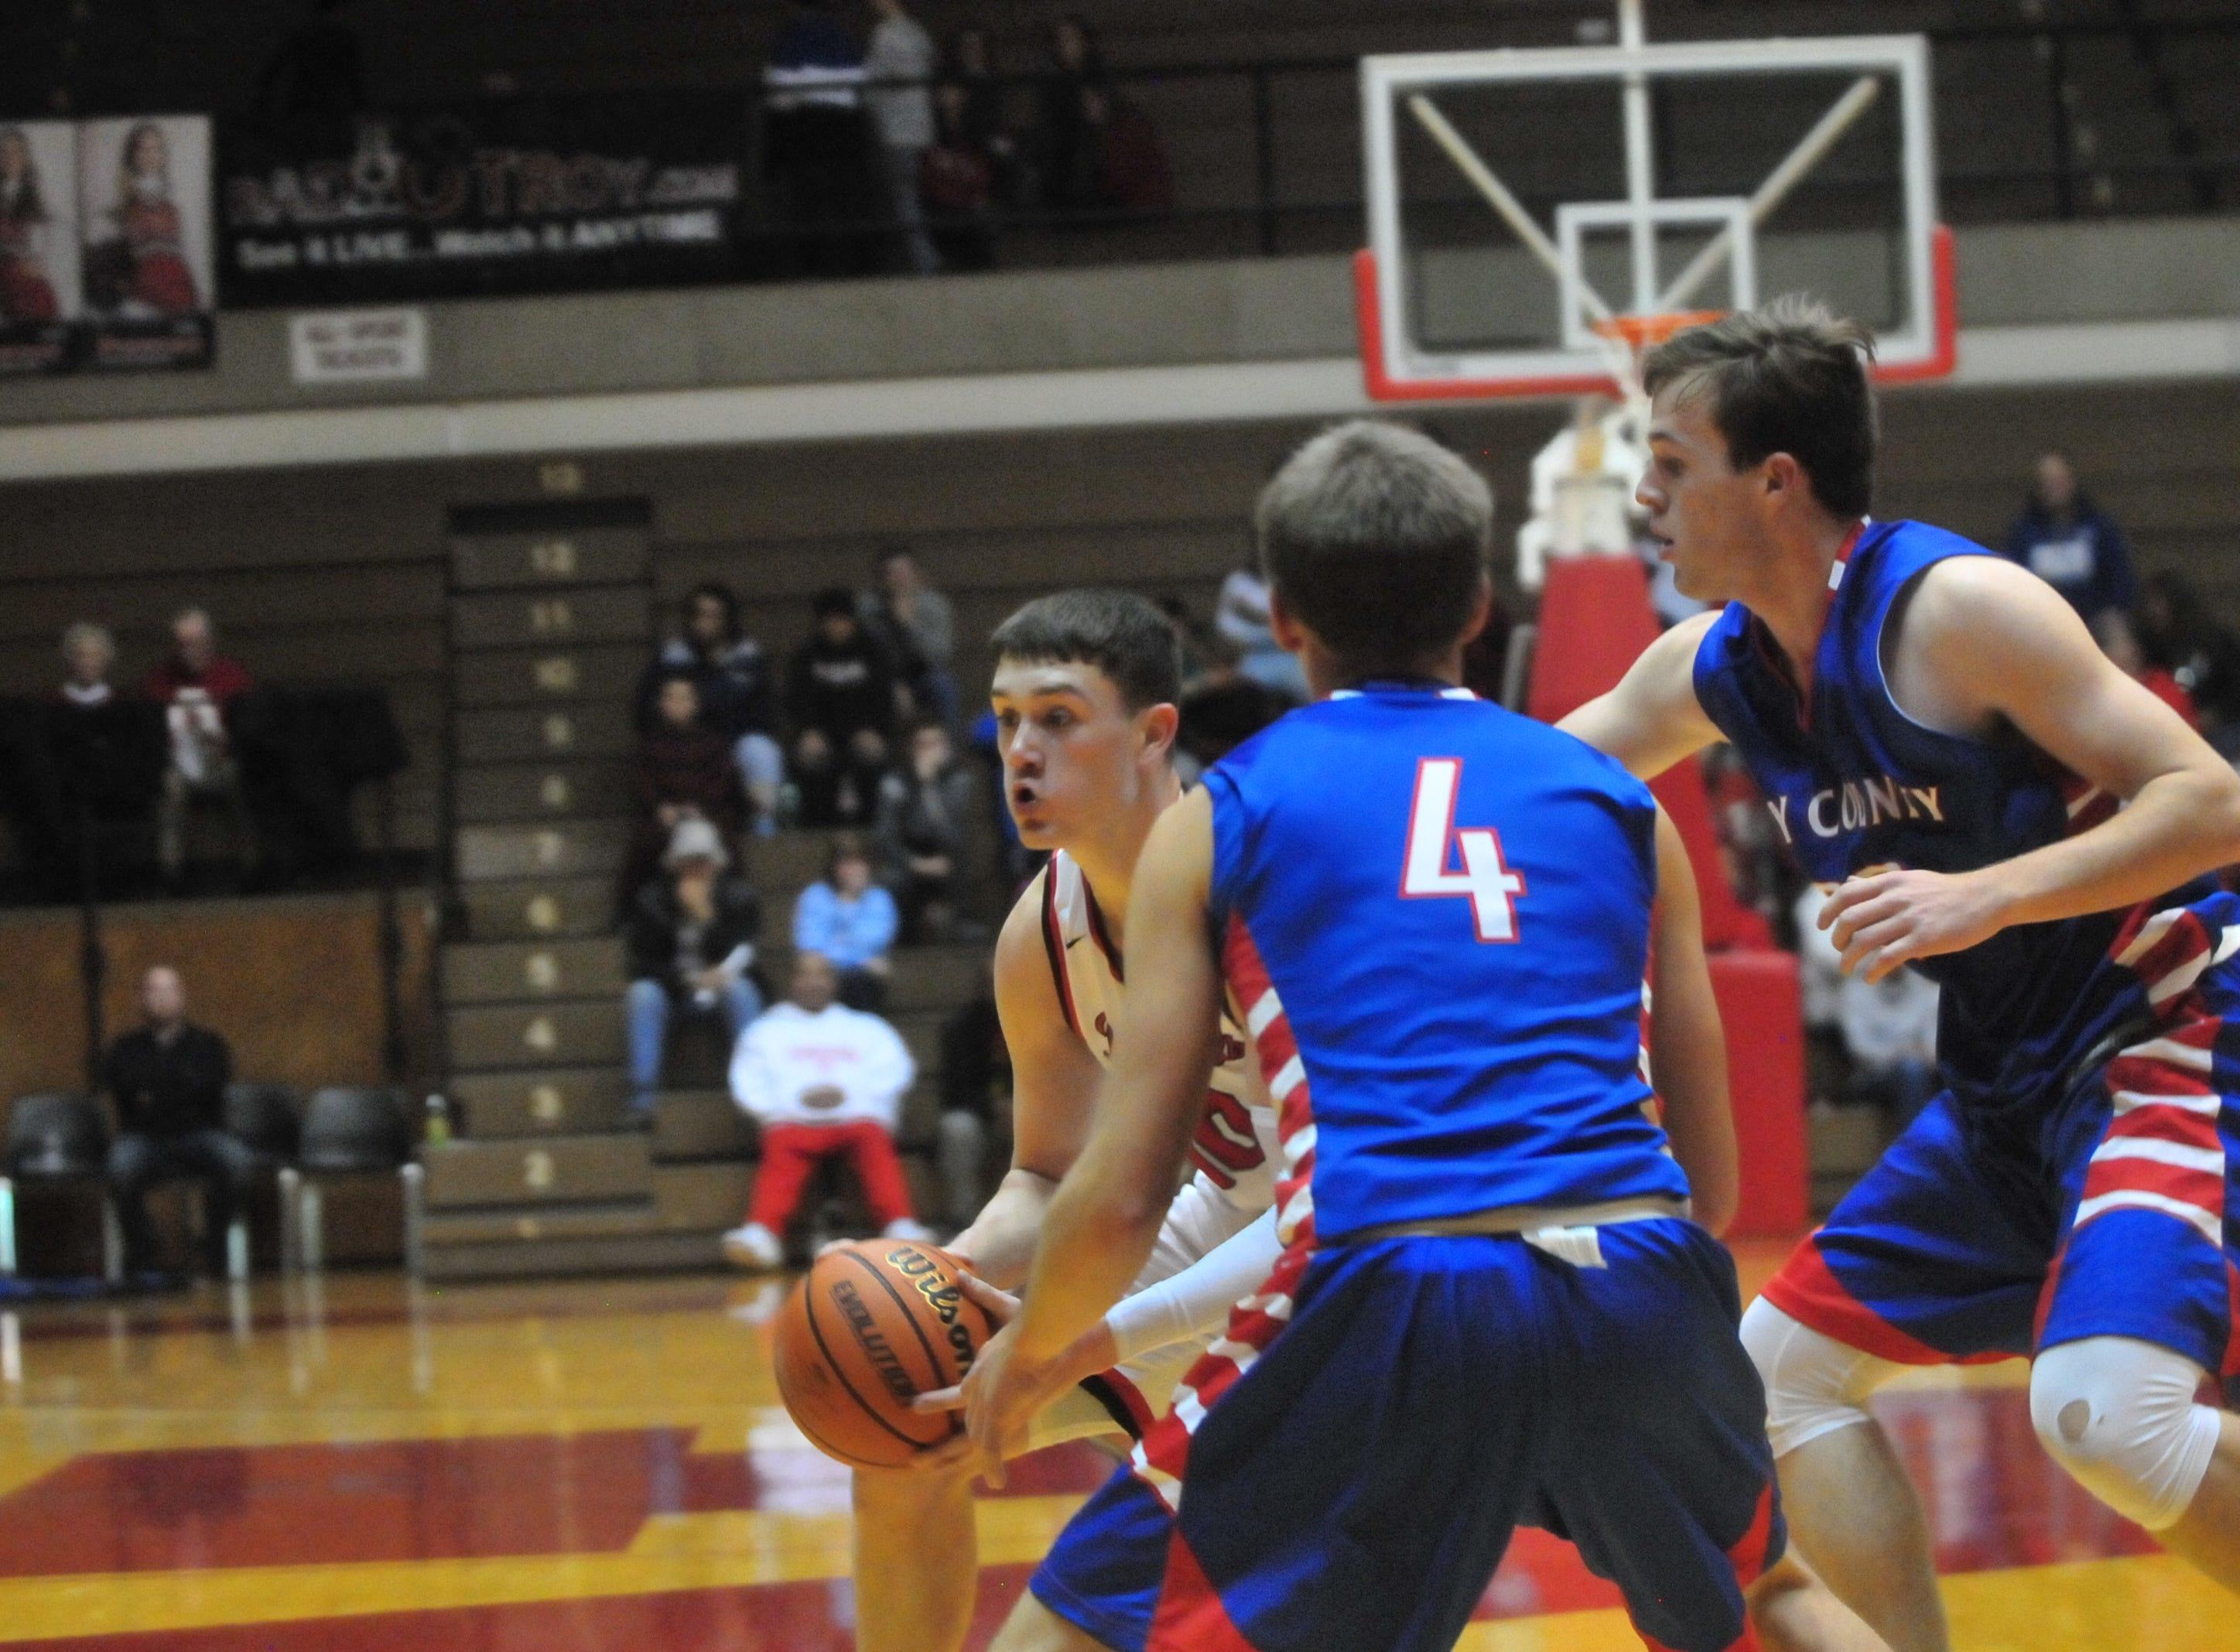 Richmond High School senior Lucas Kroft moves the ball during a boys basketball game against Jay County Saturday, Nov. 24, 2018 at Richmond High School's Tiernan Center.